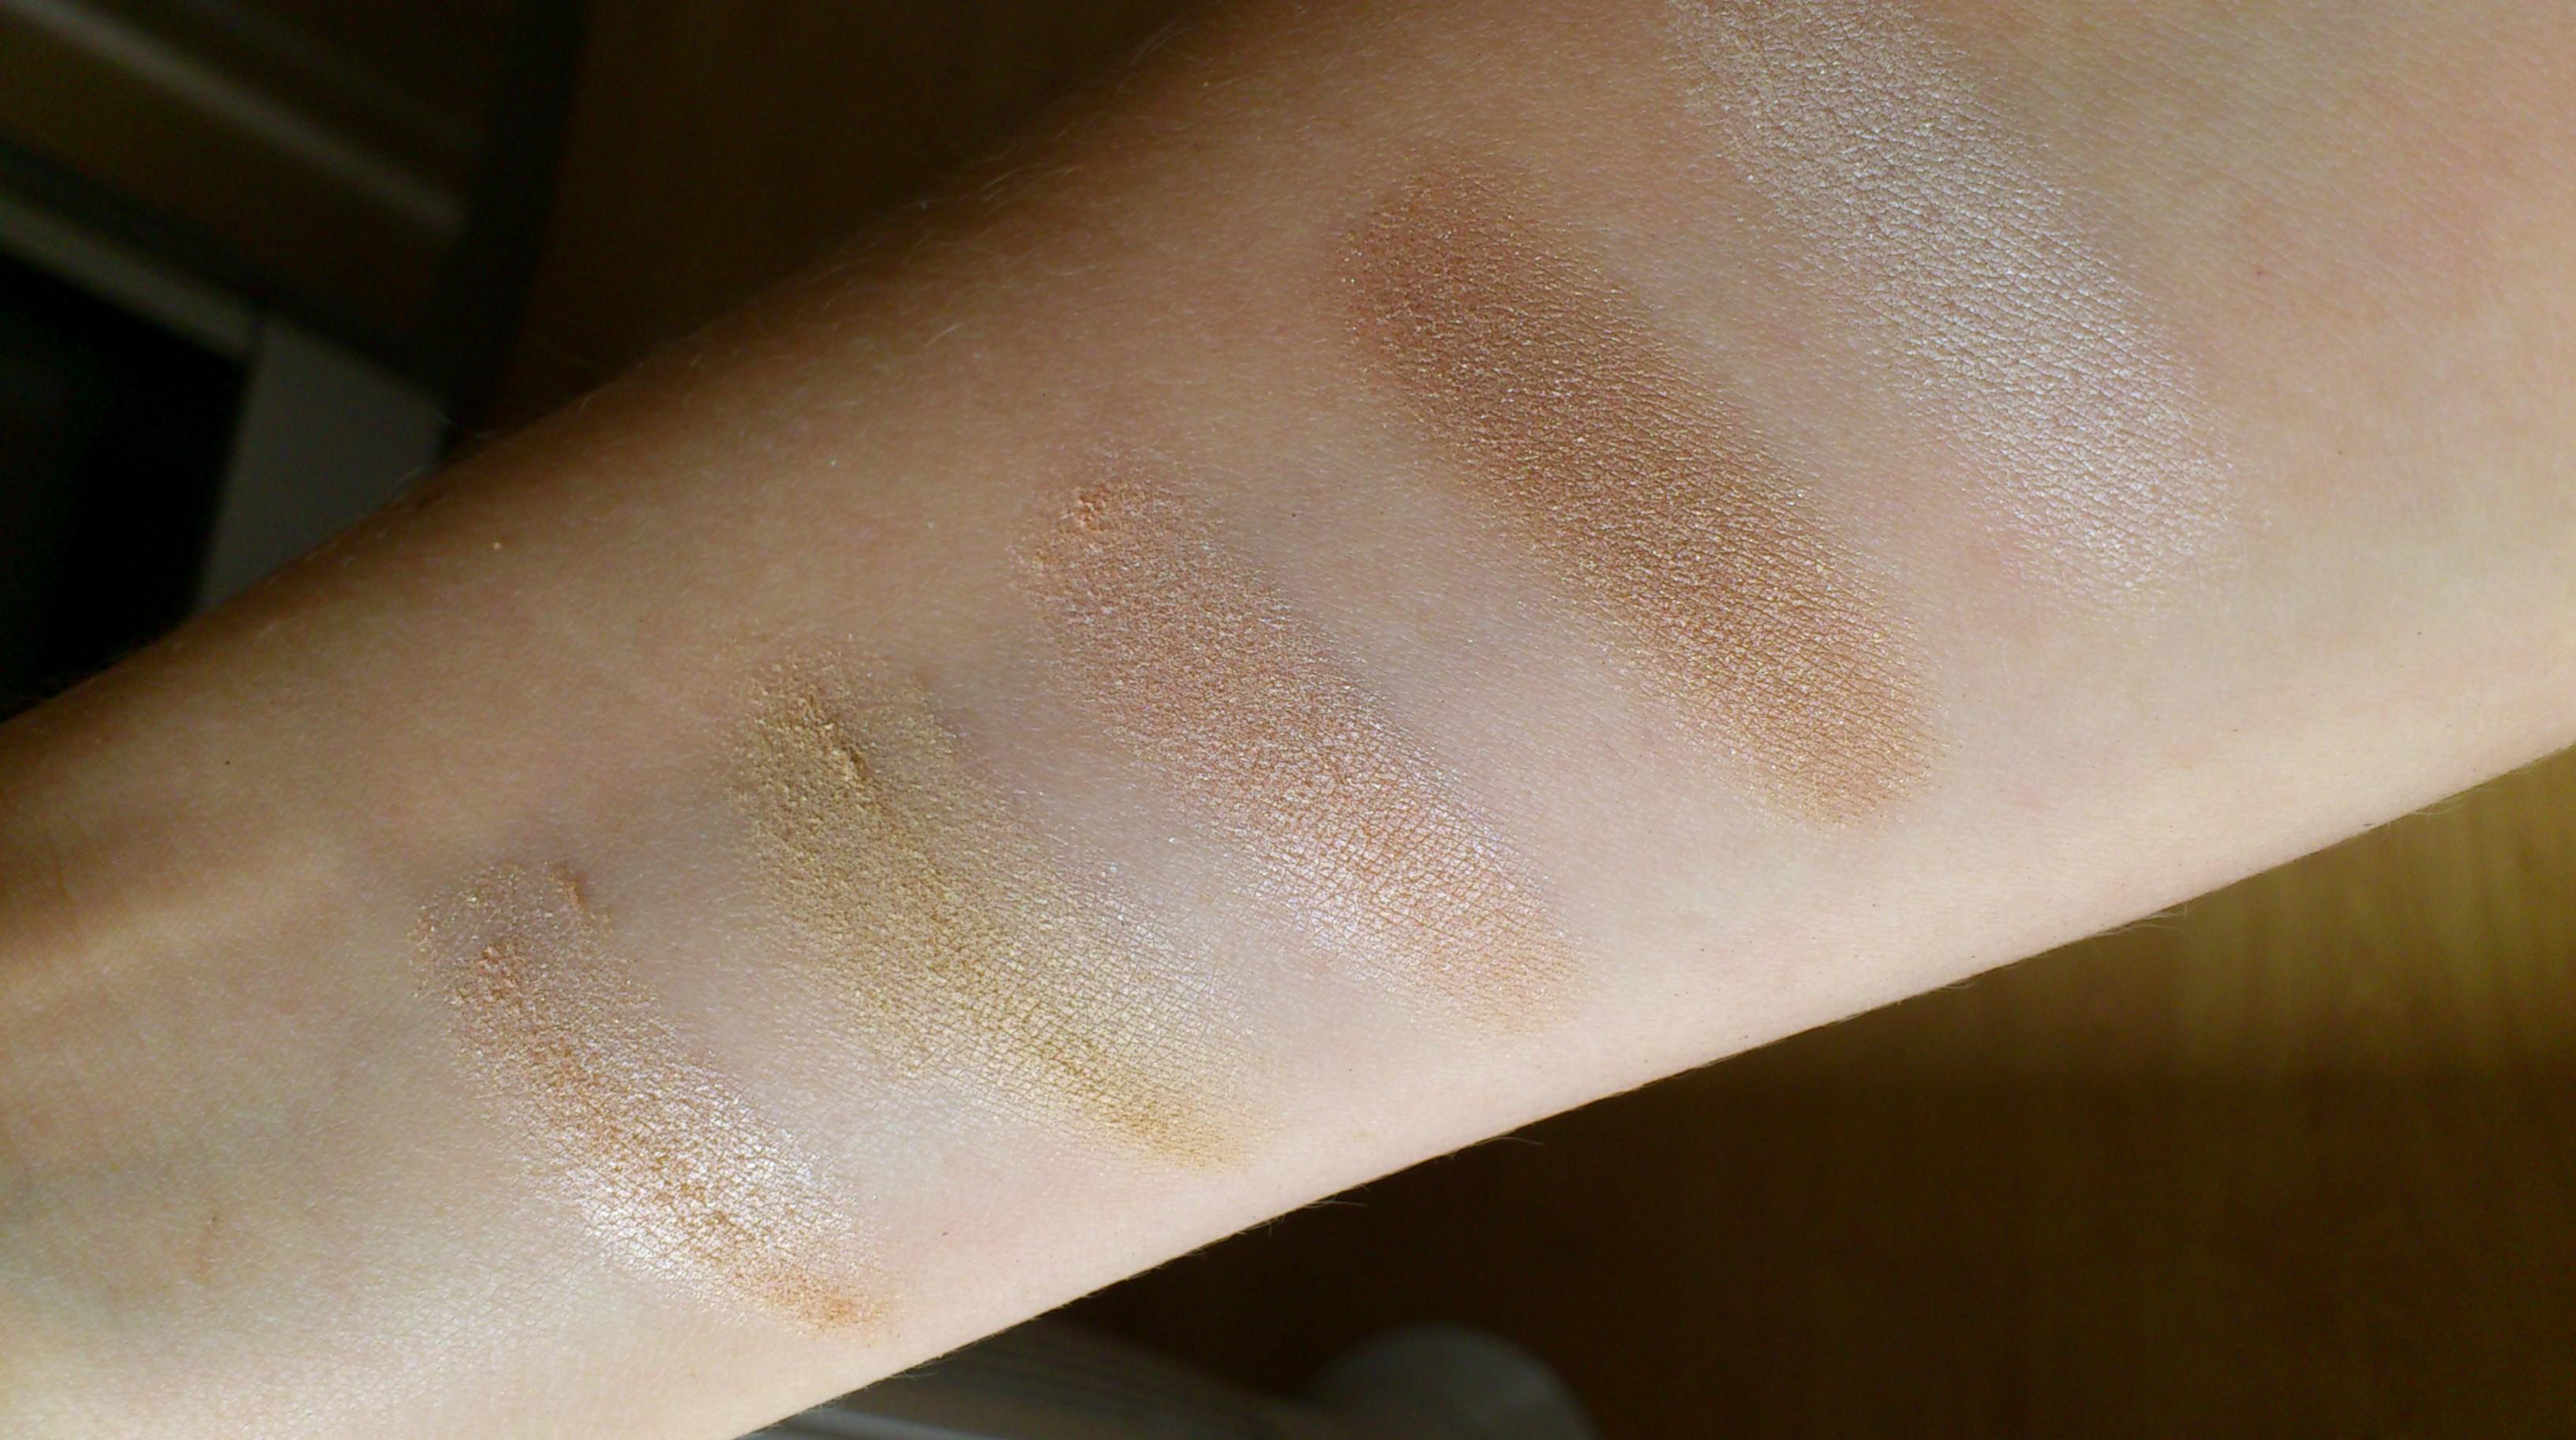 Swatch fard paupière benecos dr hauschka couleur caramel lily lolo so bio etic